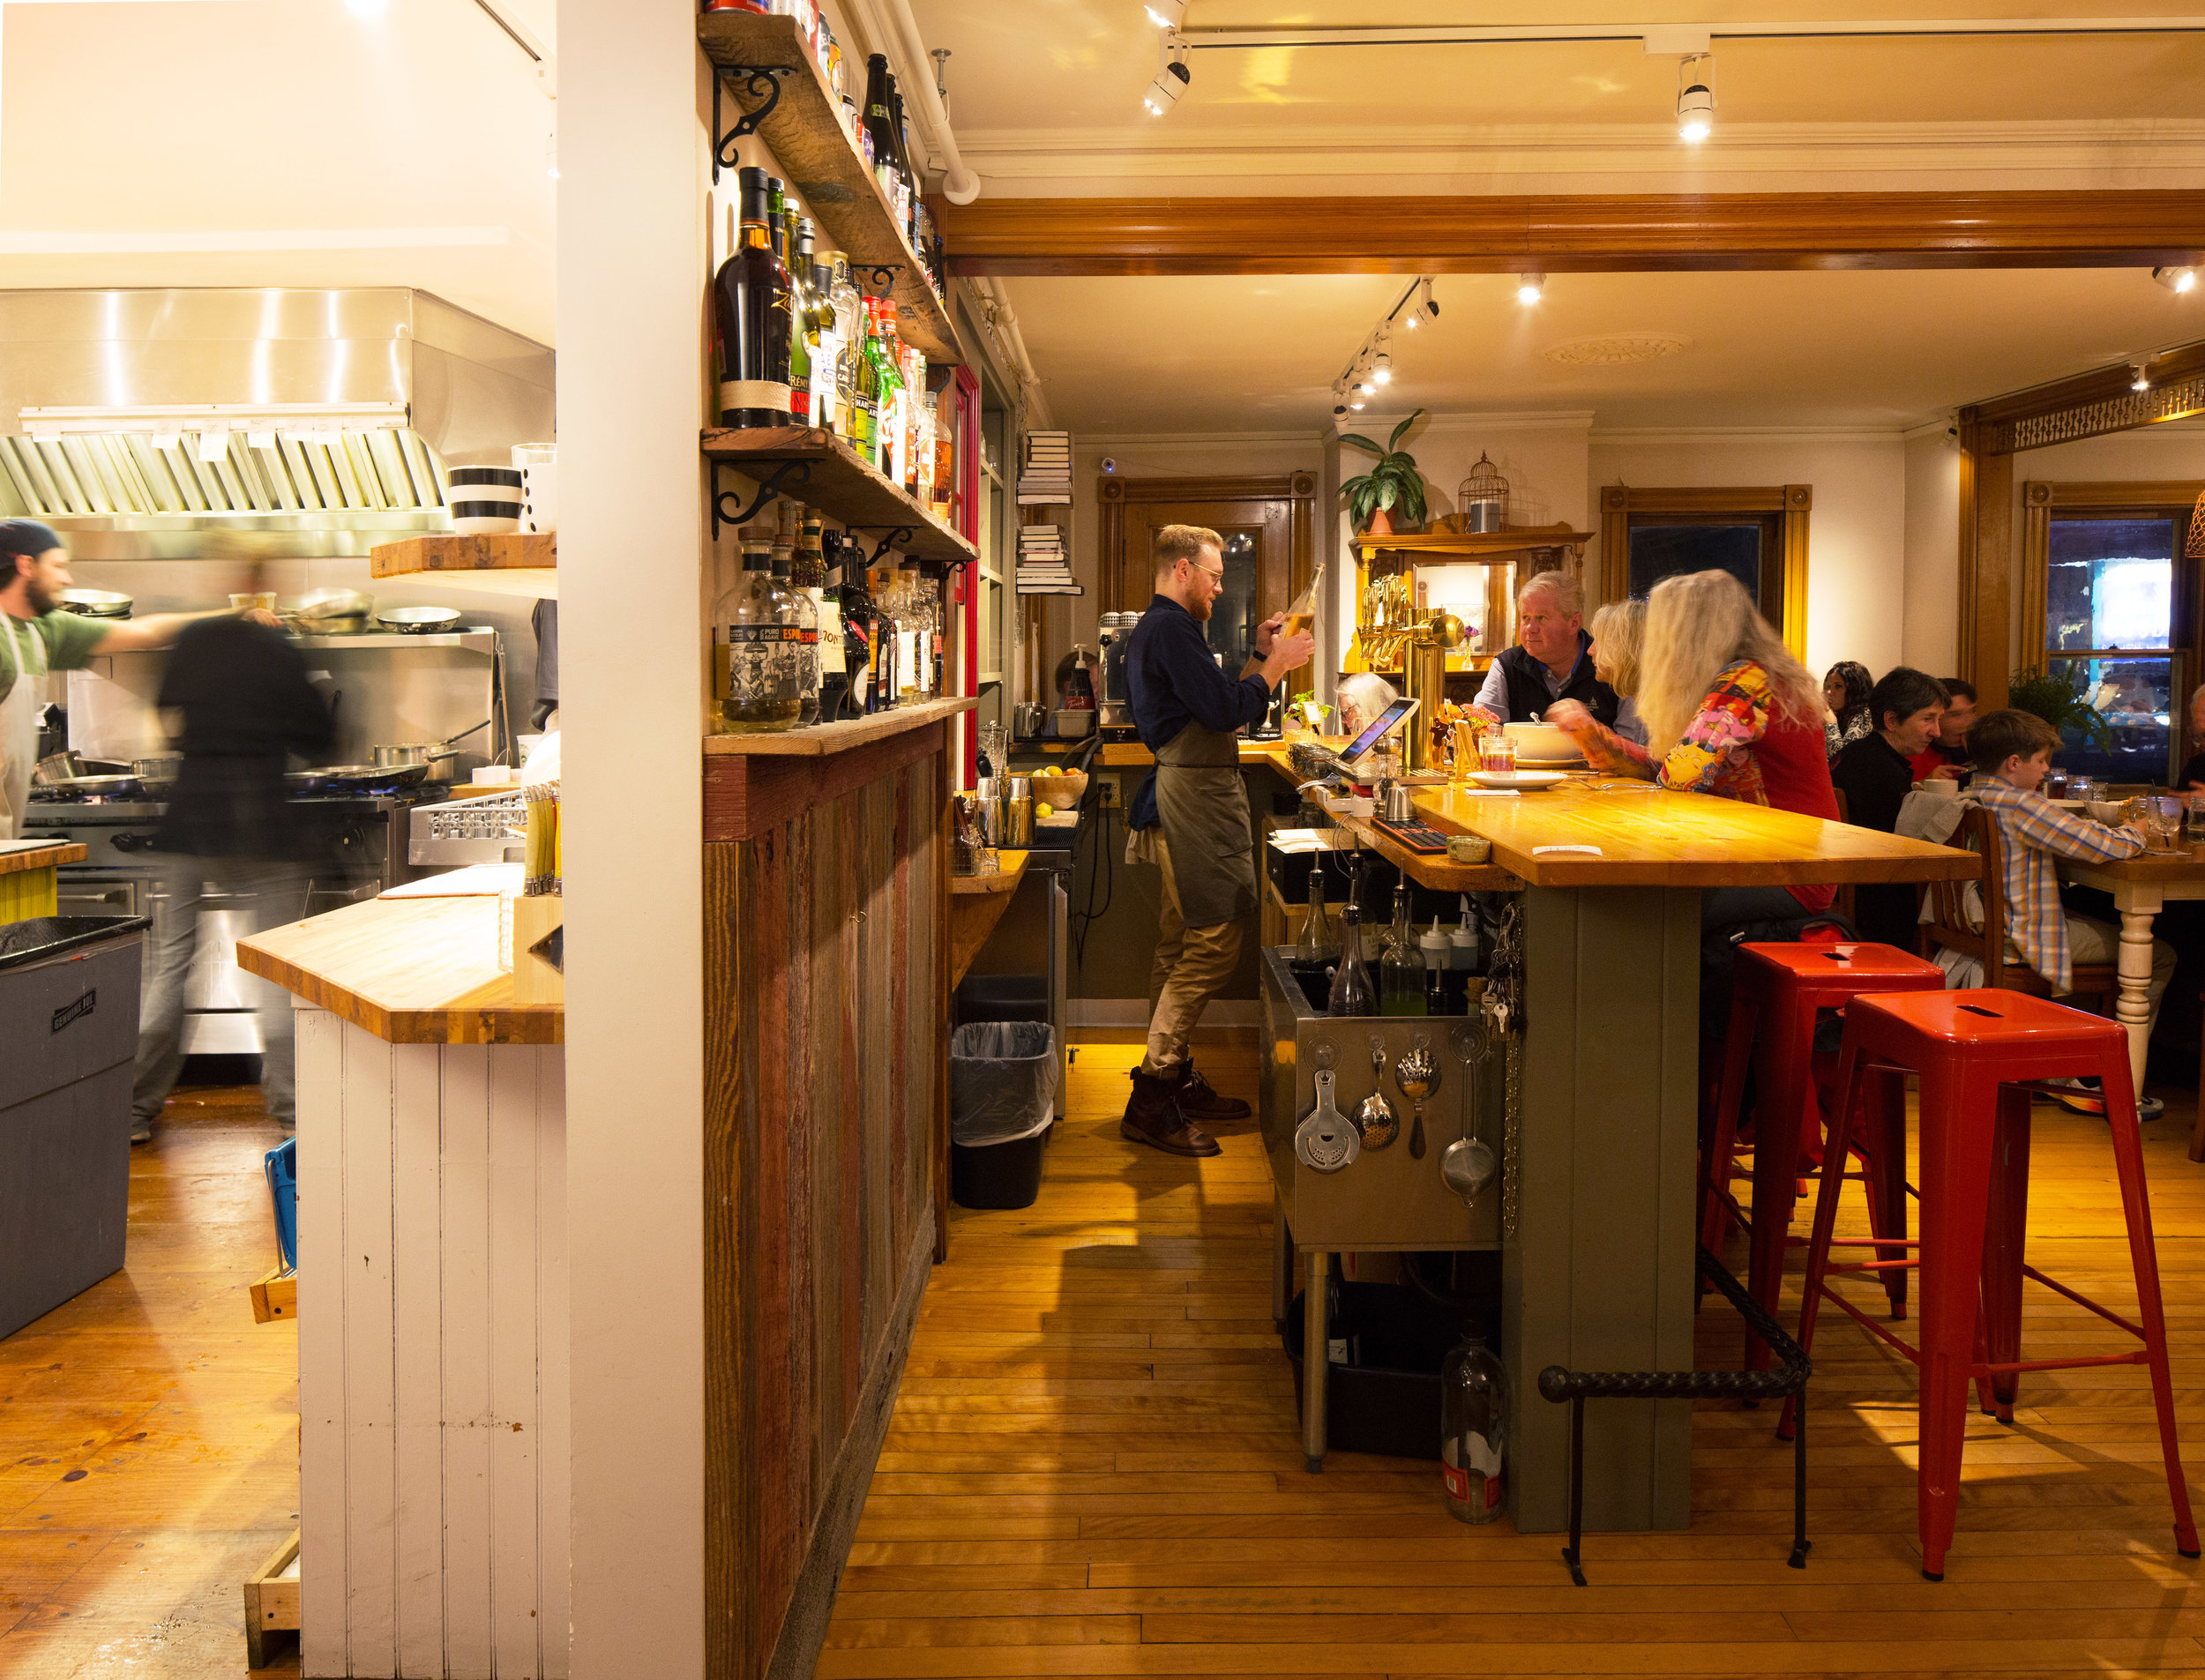 Homestyle Hostel_Restaurant + Kitchen Life.jpg